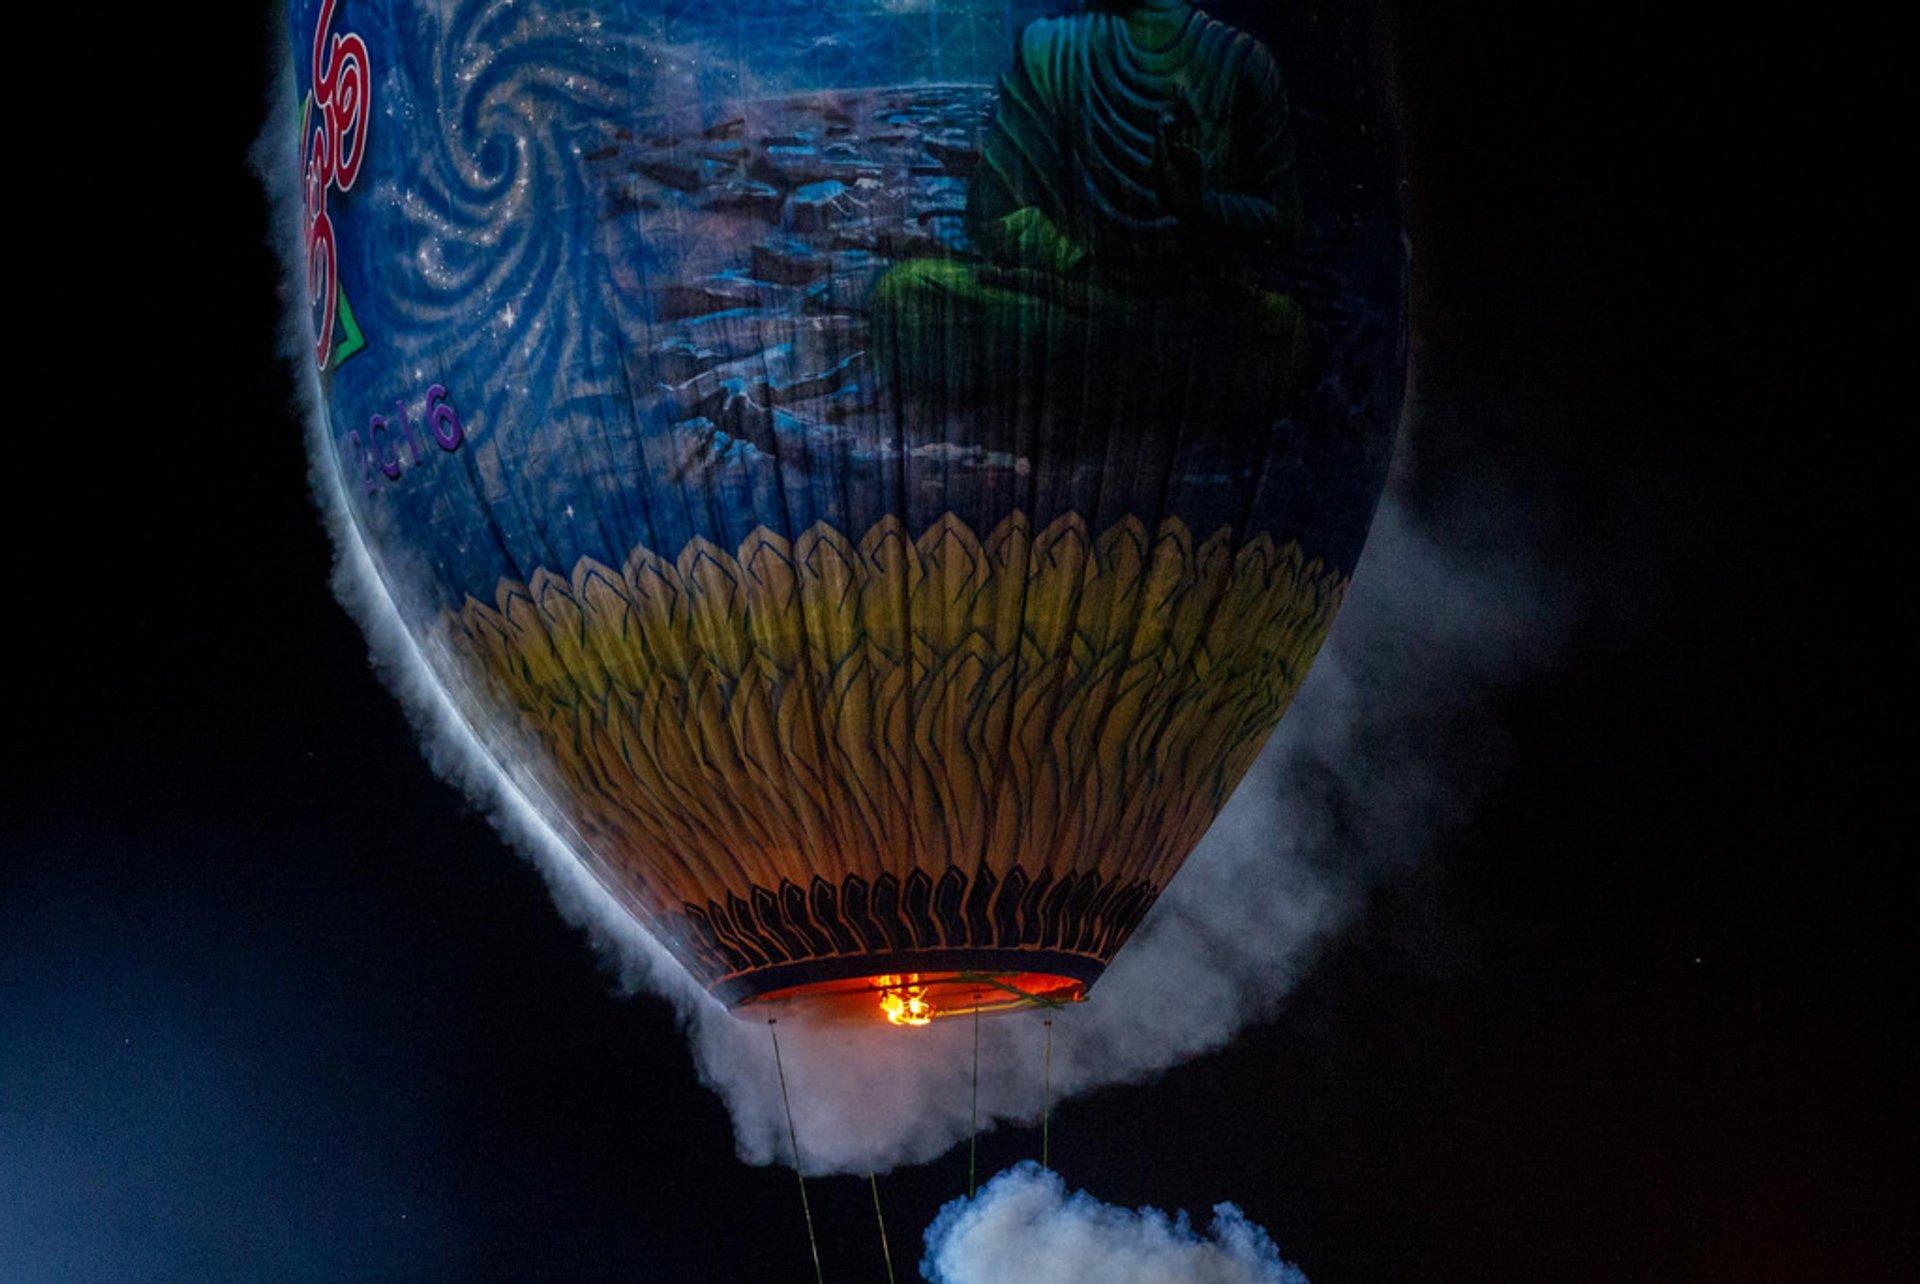 Balloon Festival in Taunggyi in Myanmar - Best Season